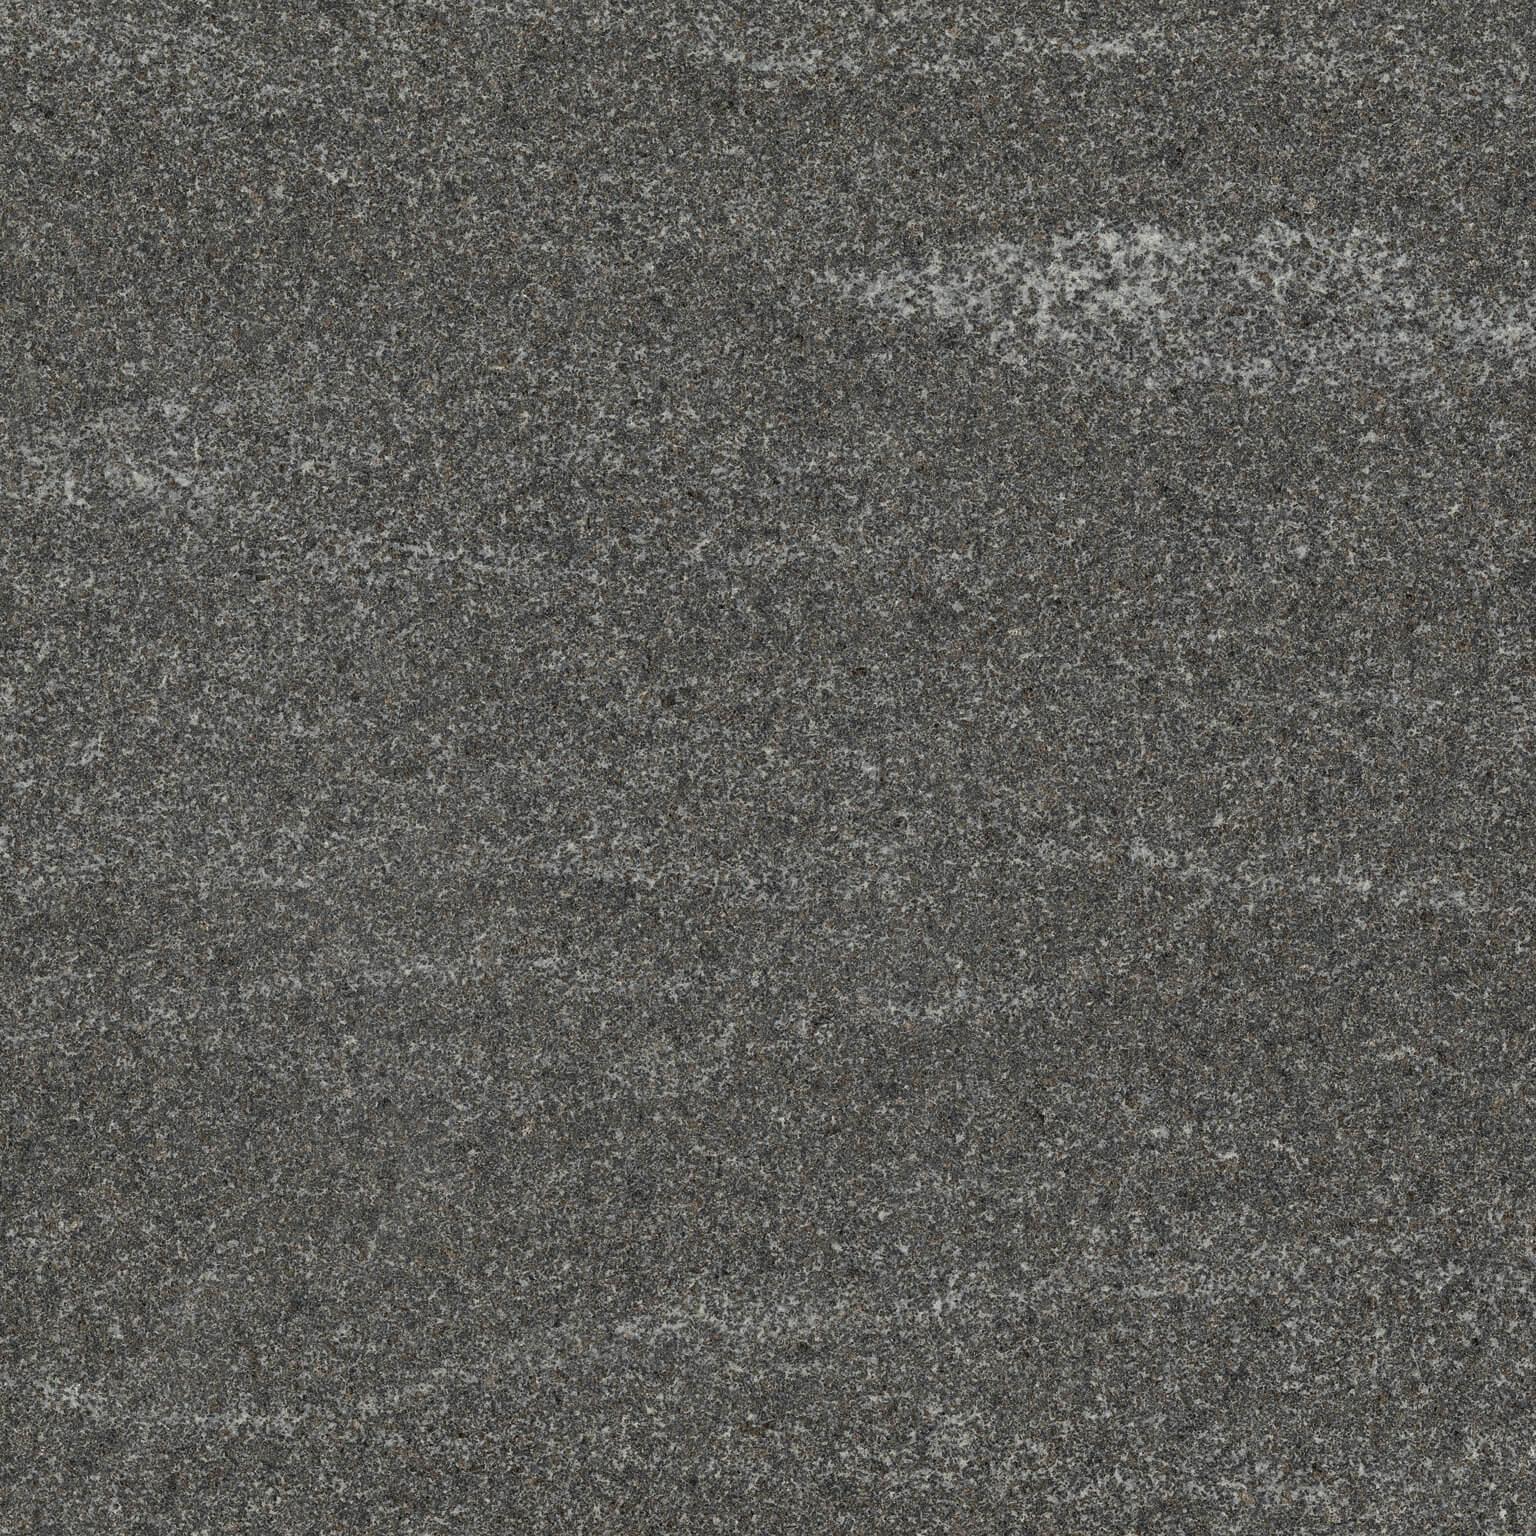 American Black 174 Structural Stone Llc